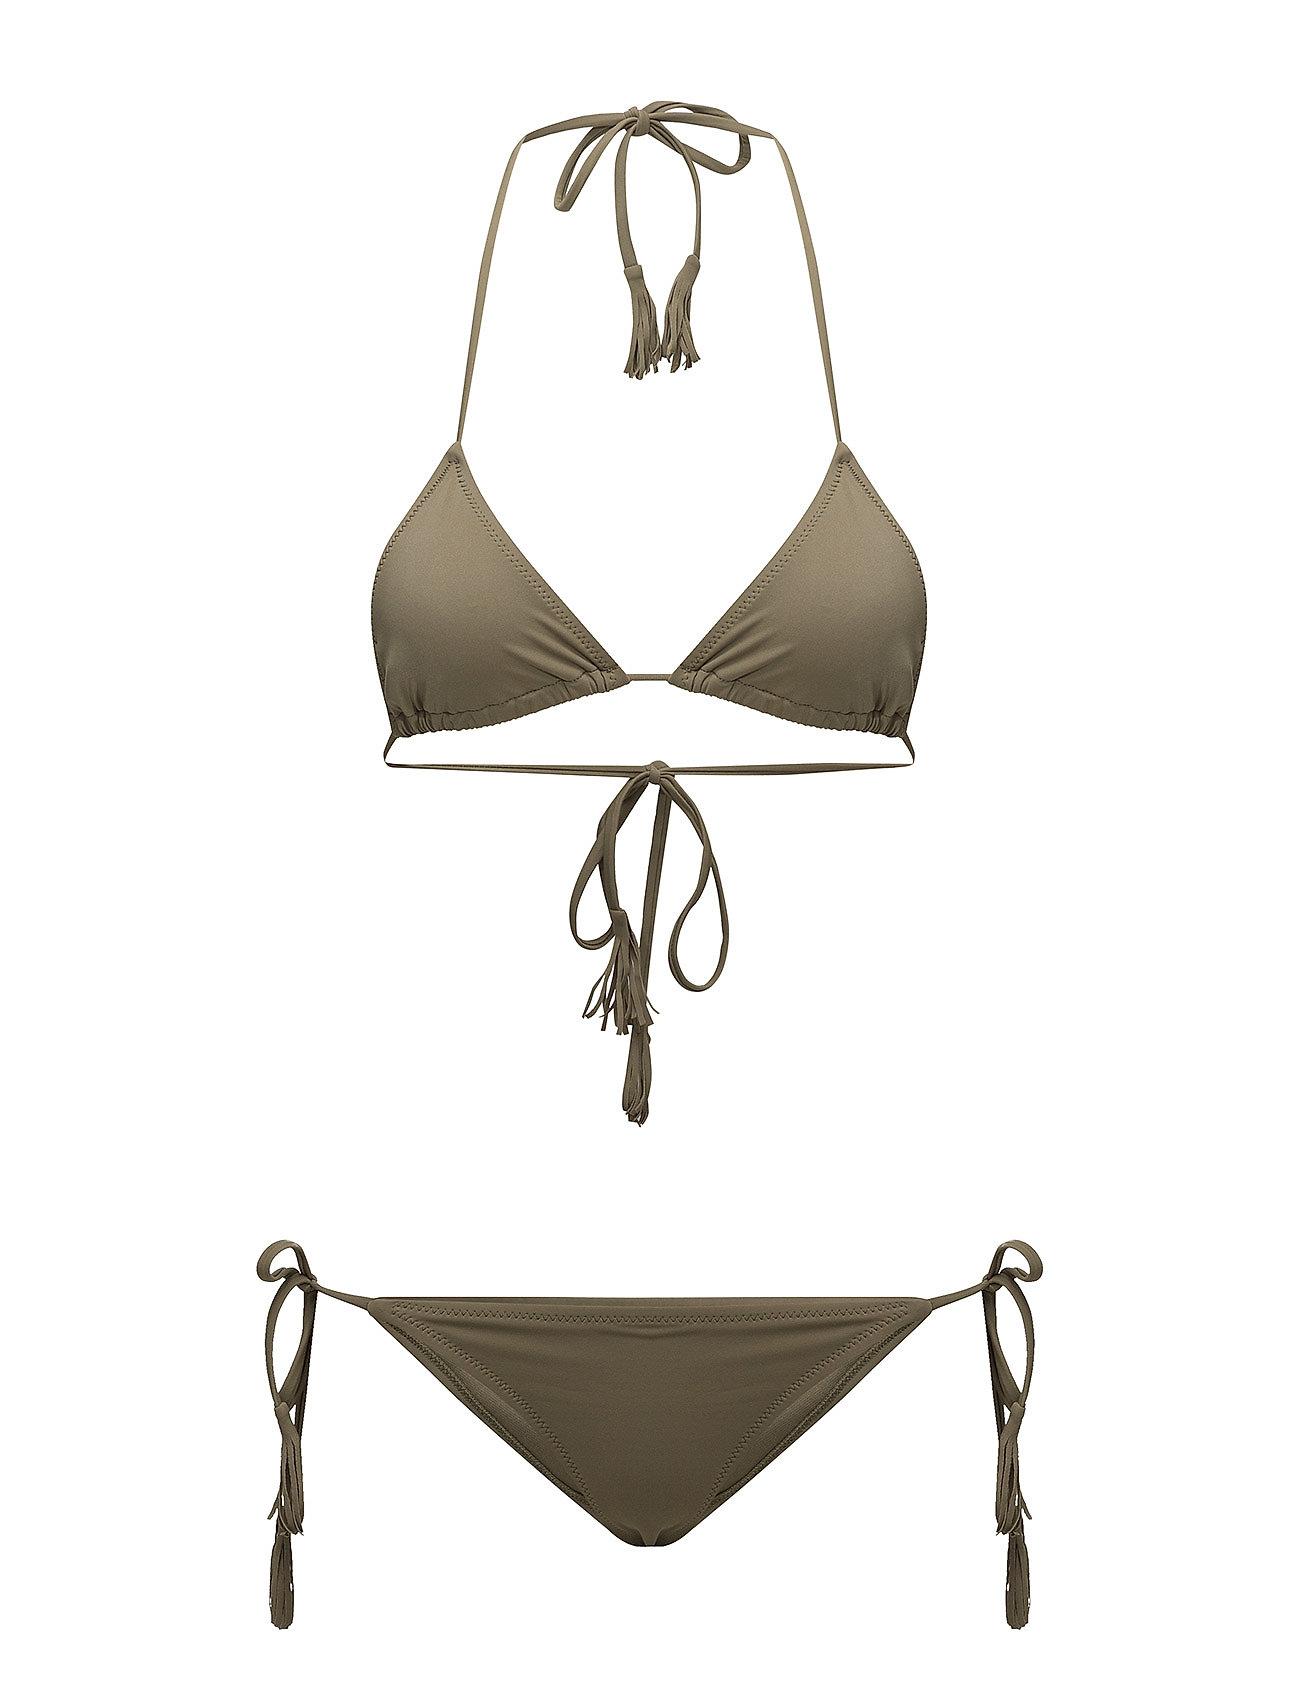 Day Birger et Mikkelsen Day Wave Lowcut Bikini